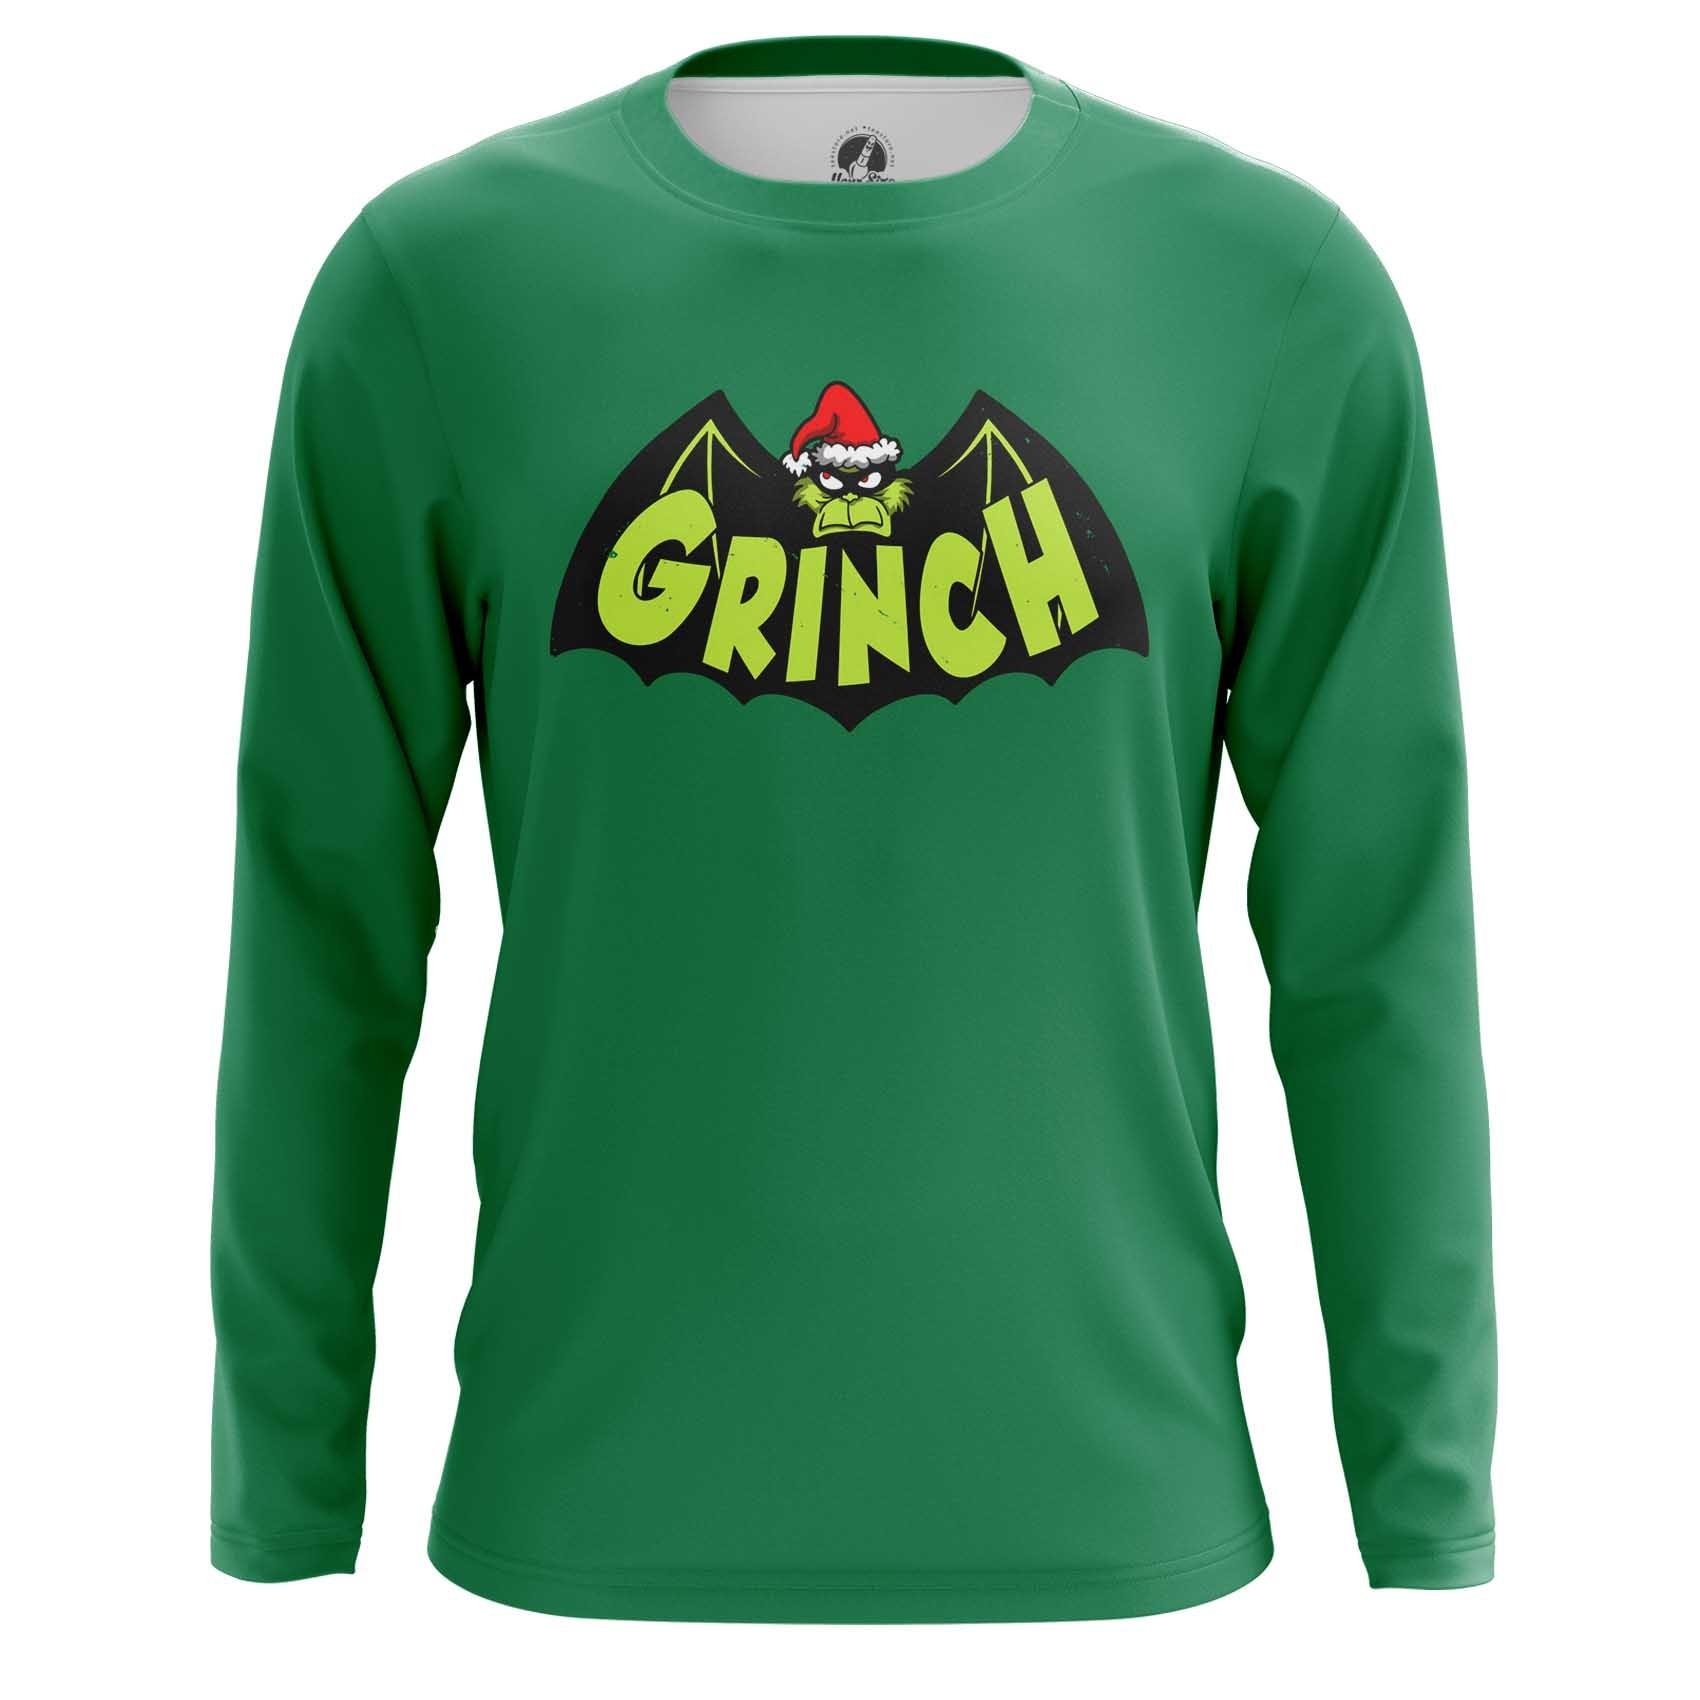 Collectibles T-Shirt Grinch Batman Christmas